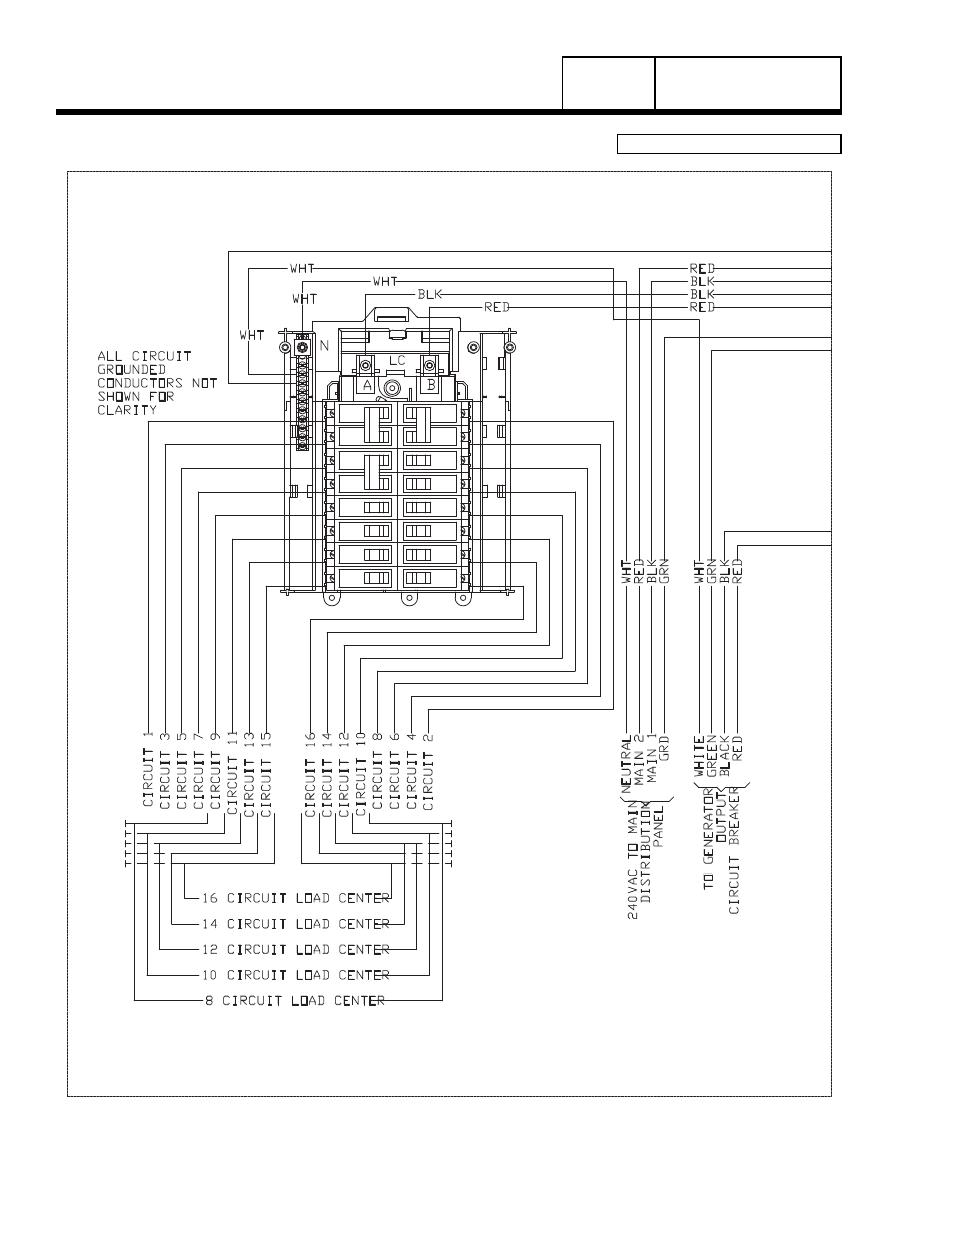 Generac Guardian 8kw Wiring Diagram